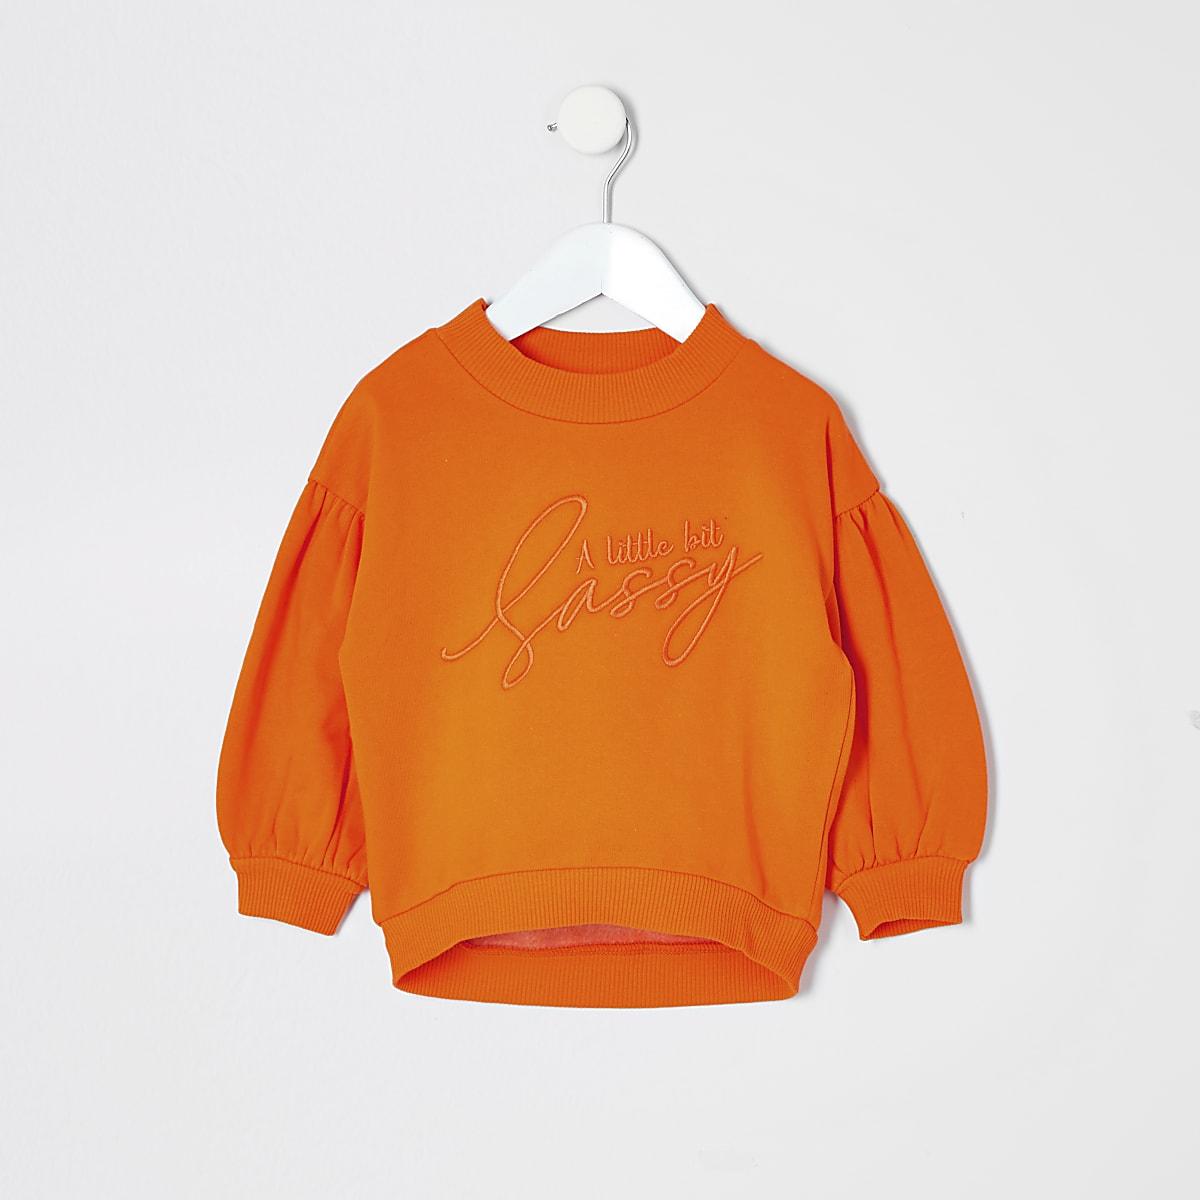 Mini girls 'a little bit sassy' sweatshirt